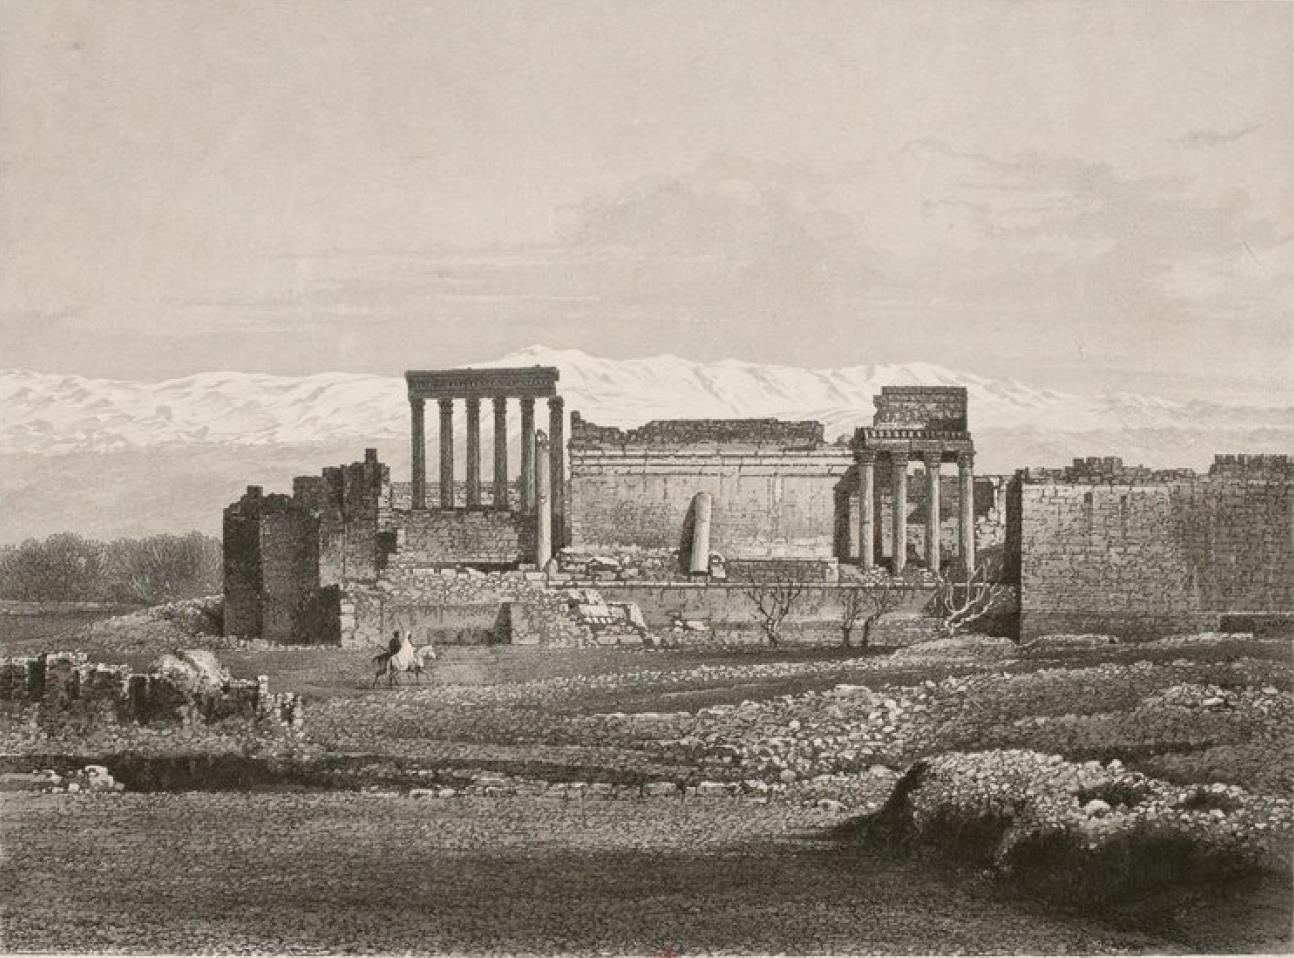 Ливан. Храм Солнца в Баальбеке